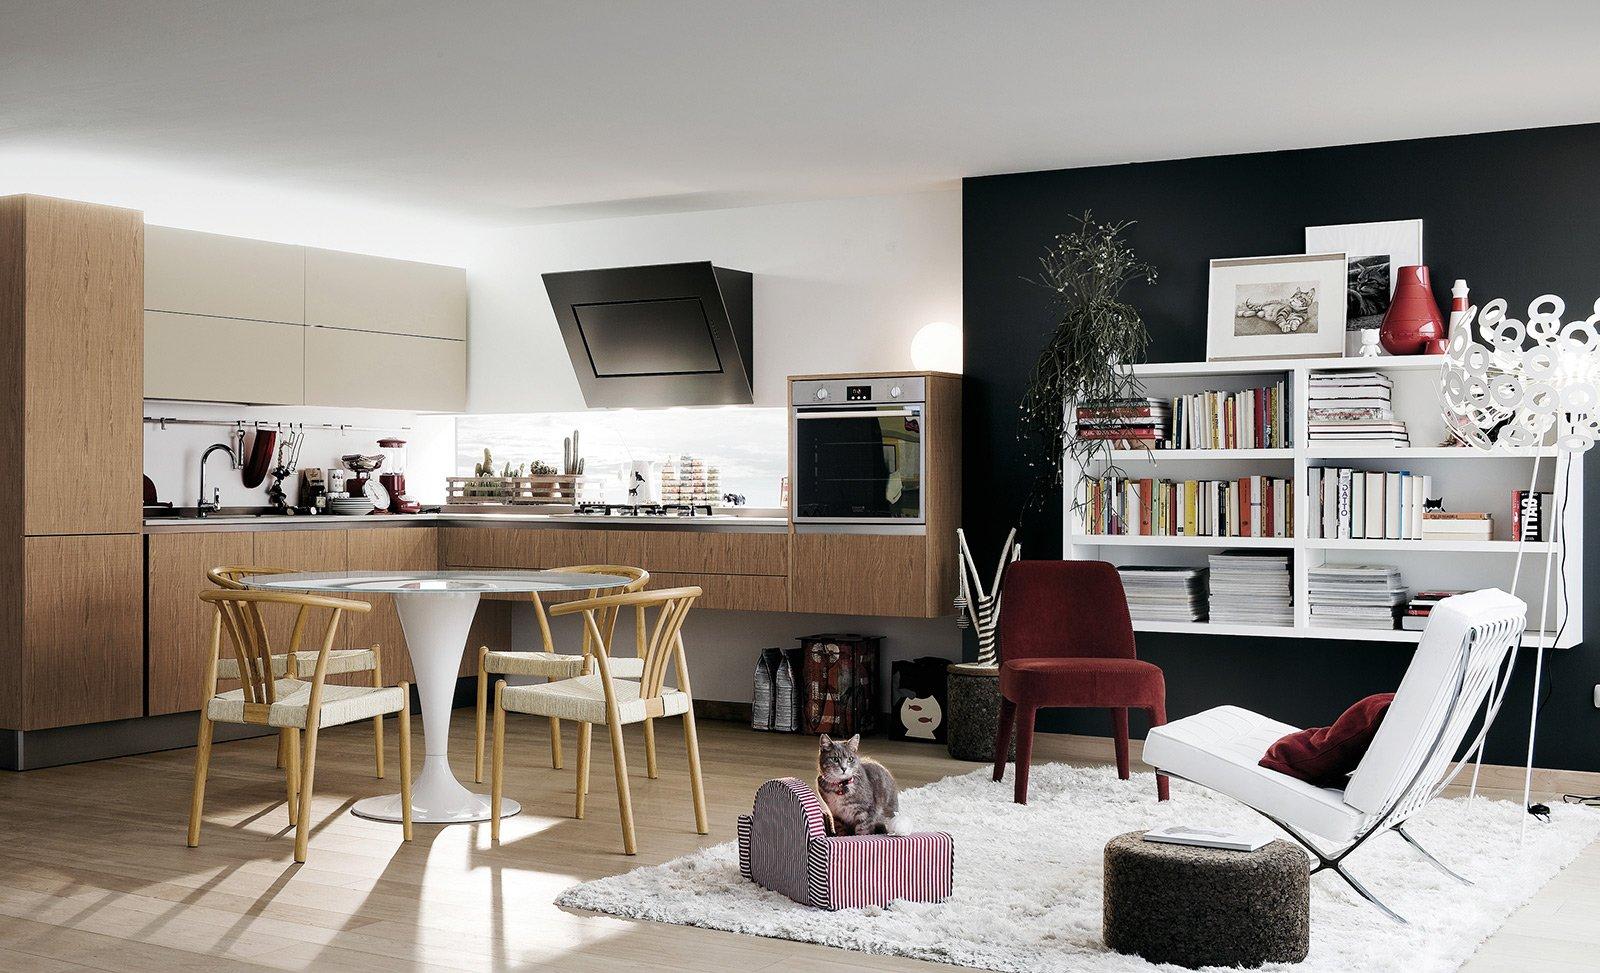 Nella Cucina Extra.go Di Veneta Cucine Basi A Terra E Moduli Sospesi  #664838 1600 973 Open Space Con Sala Da Pranzo